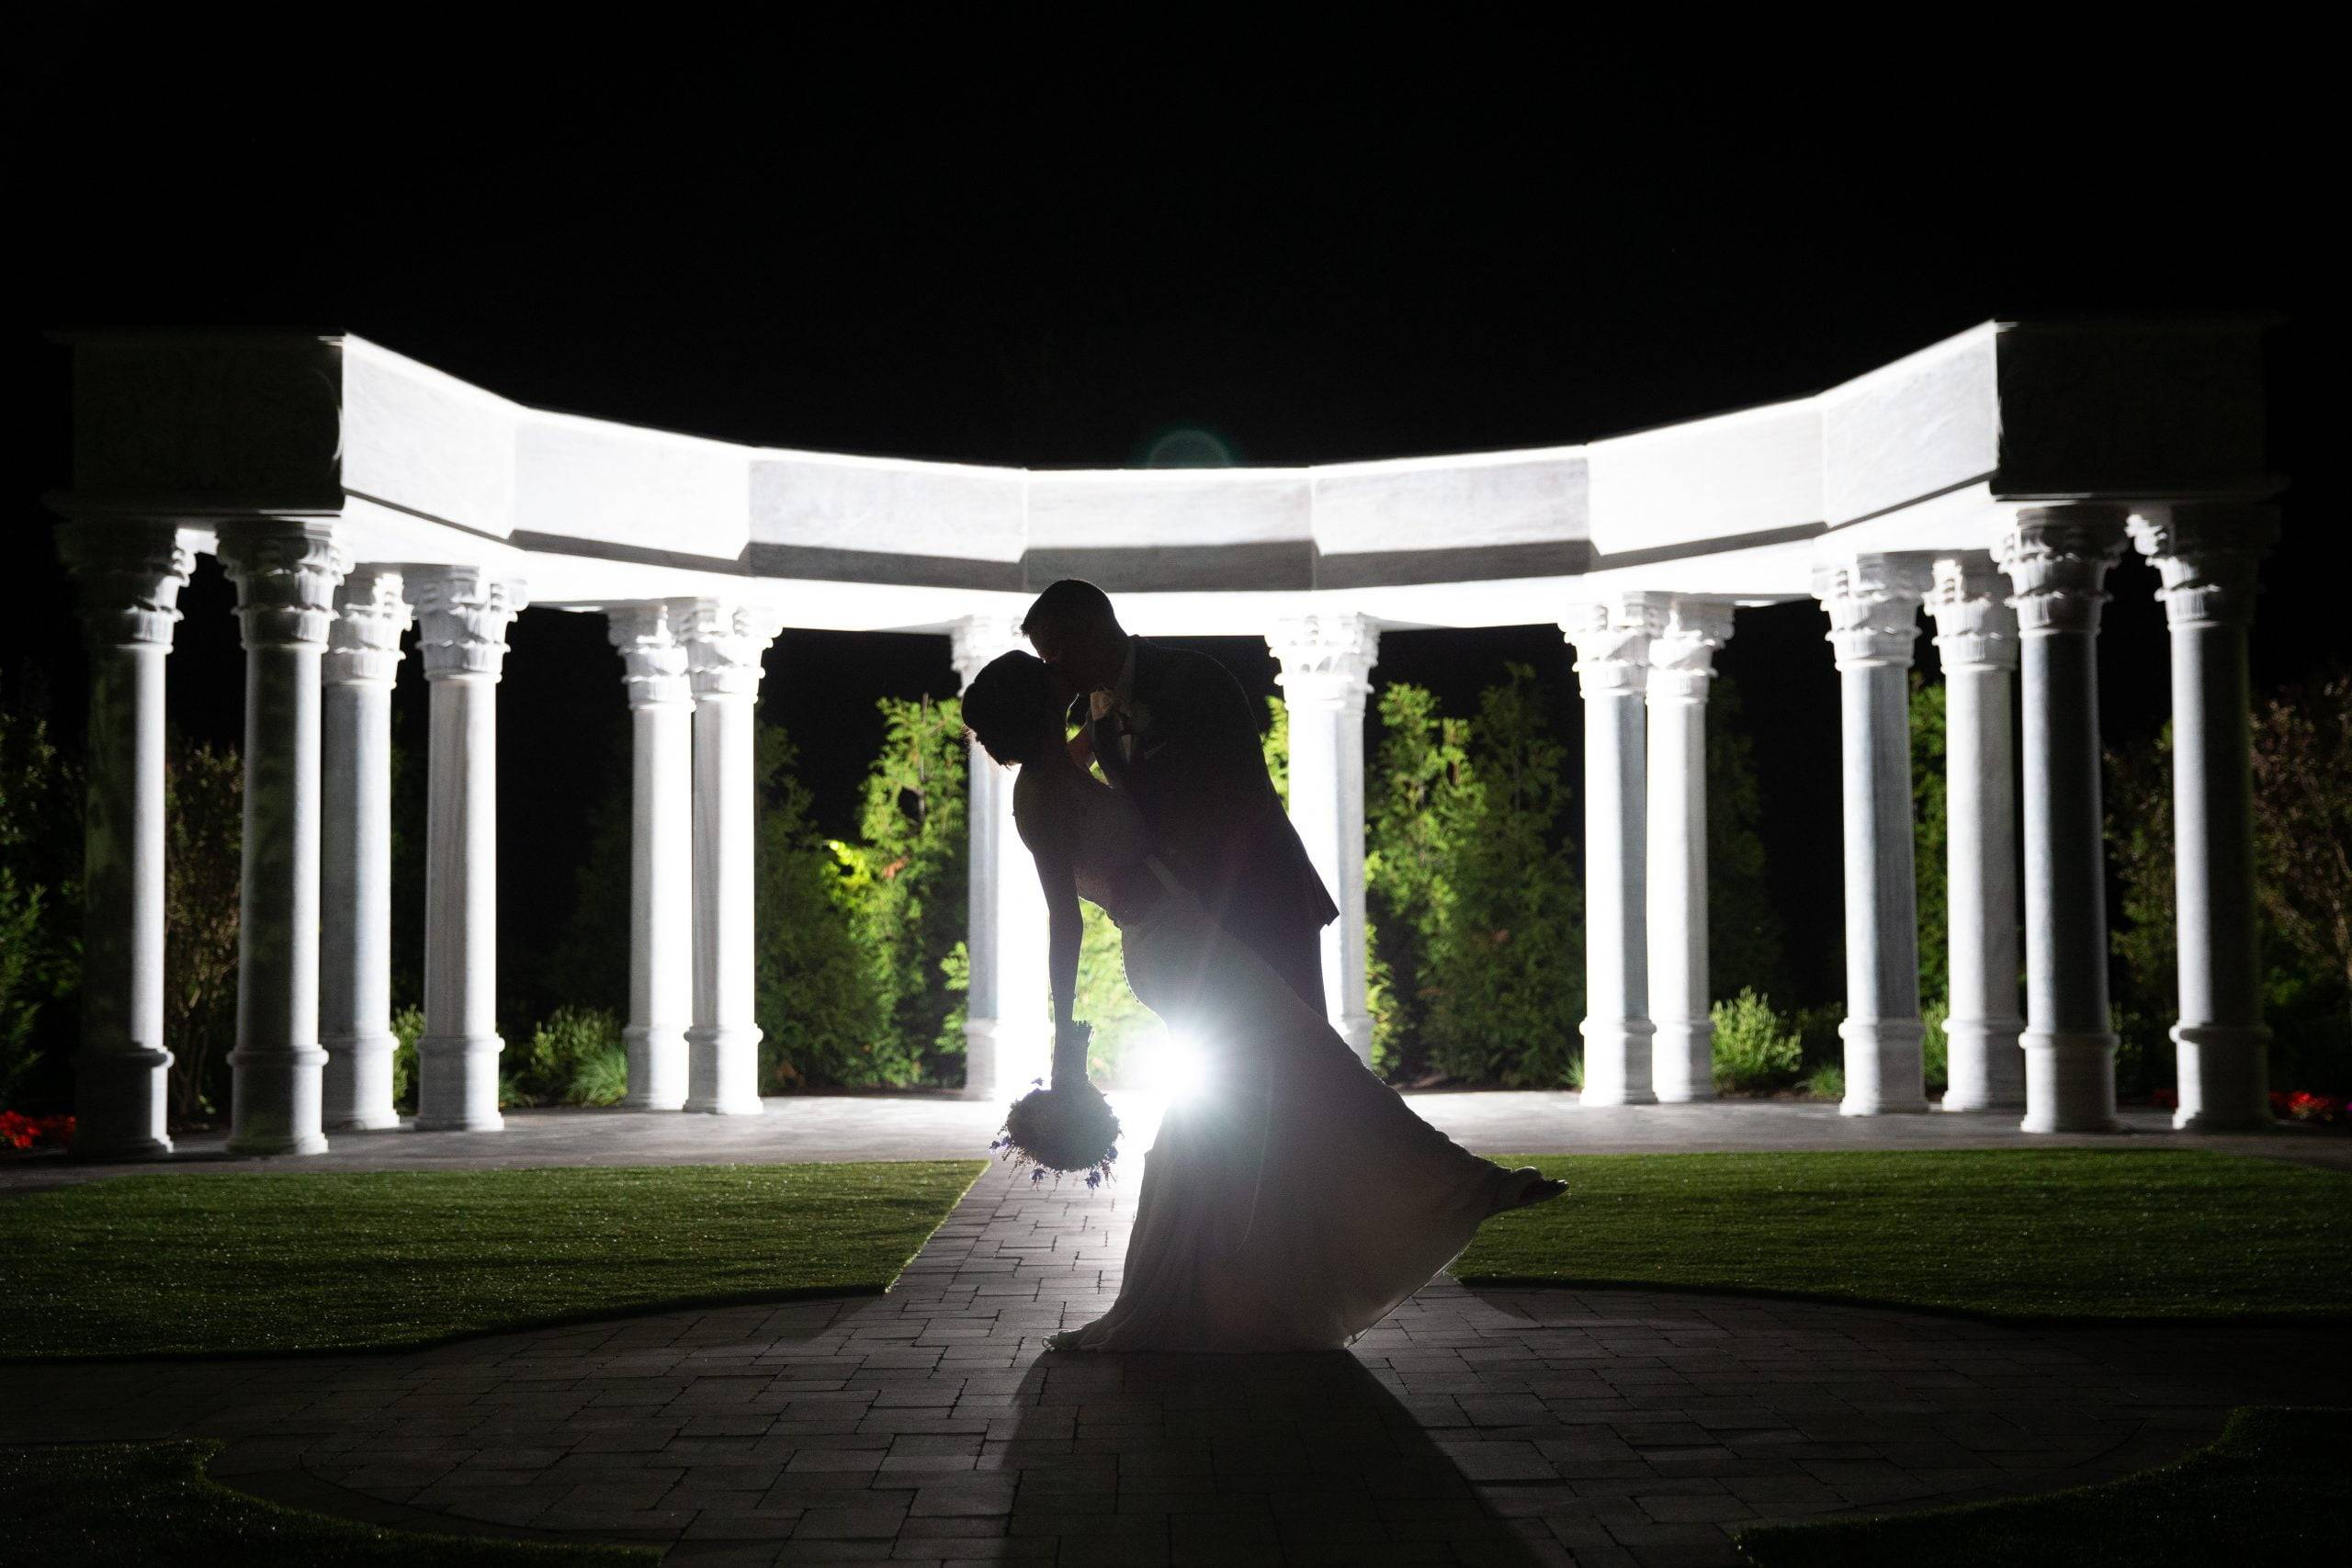 Meadow Wood nighttime bride and groom kiss